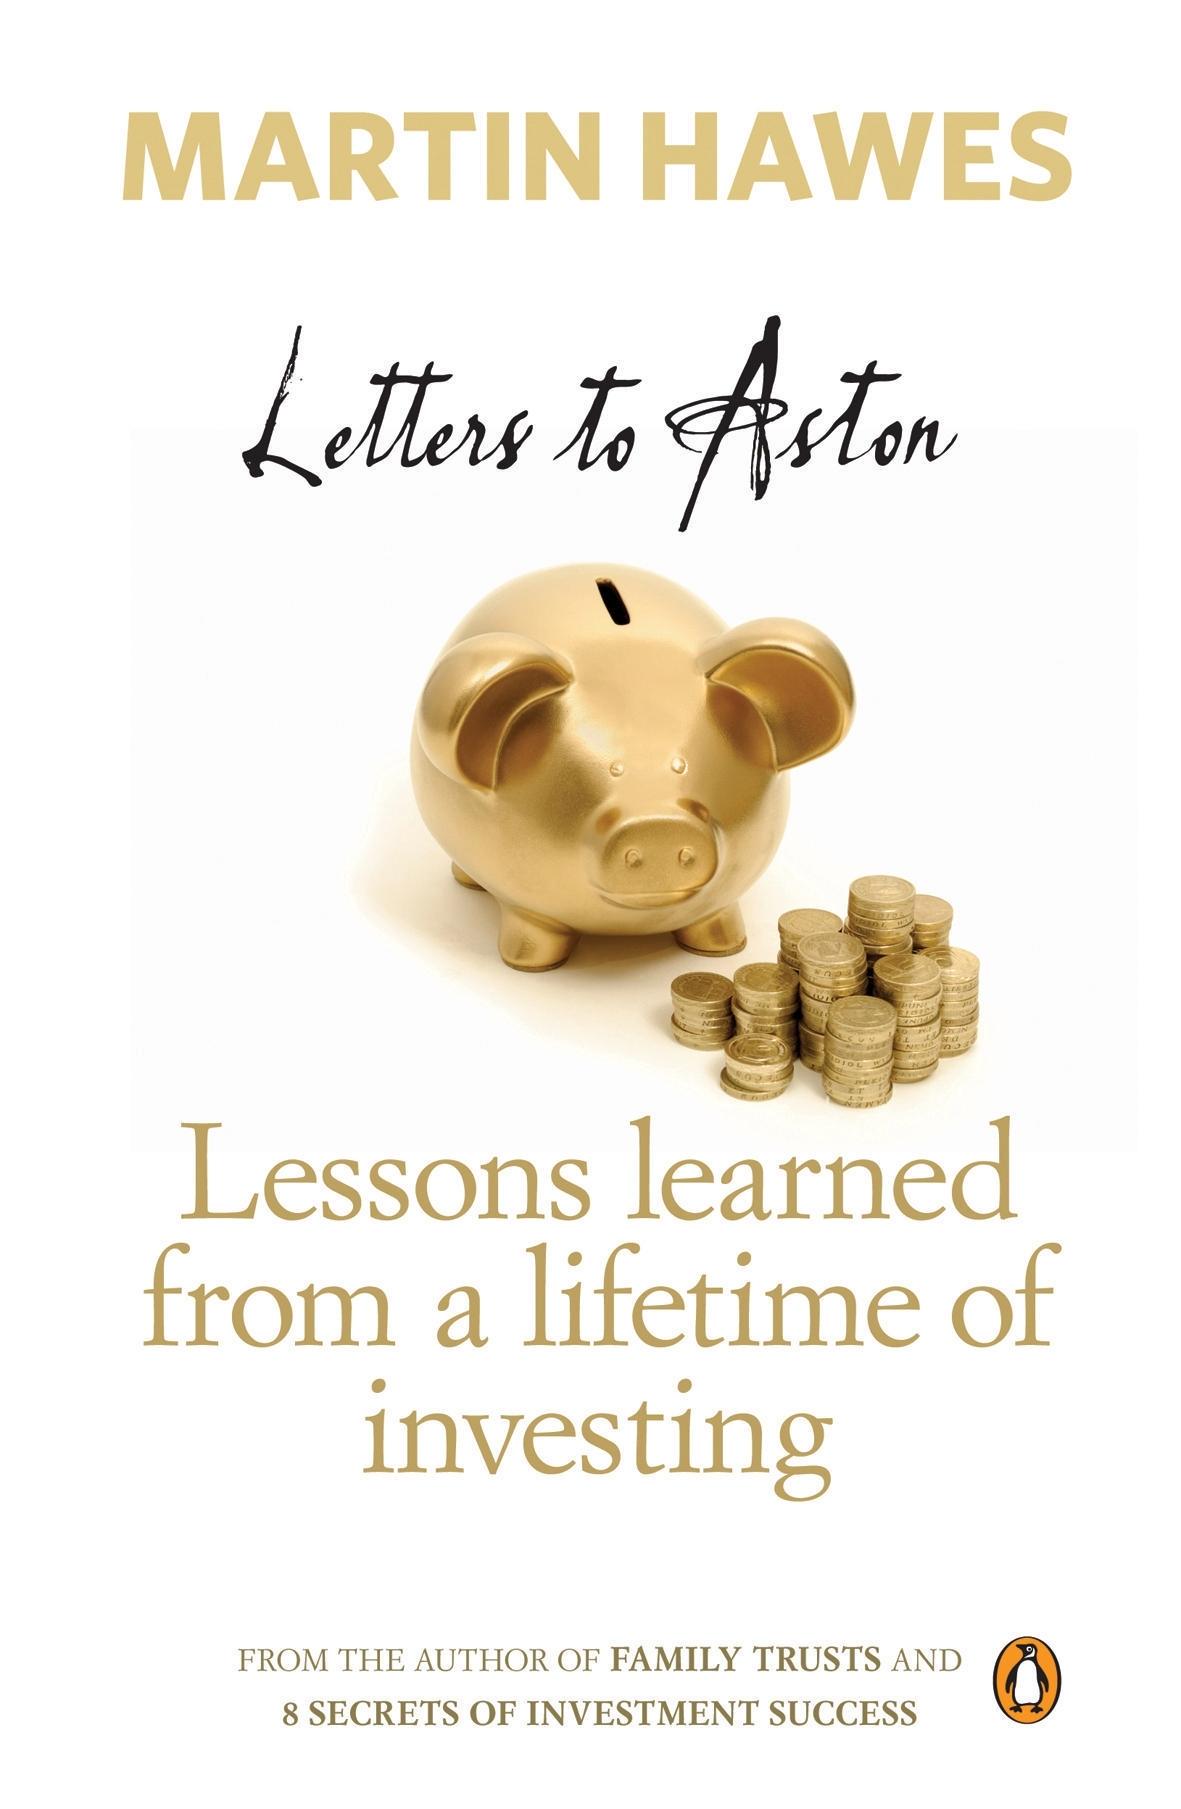 8 secrets of investment success